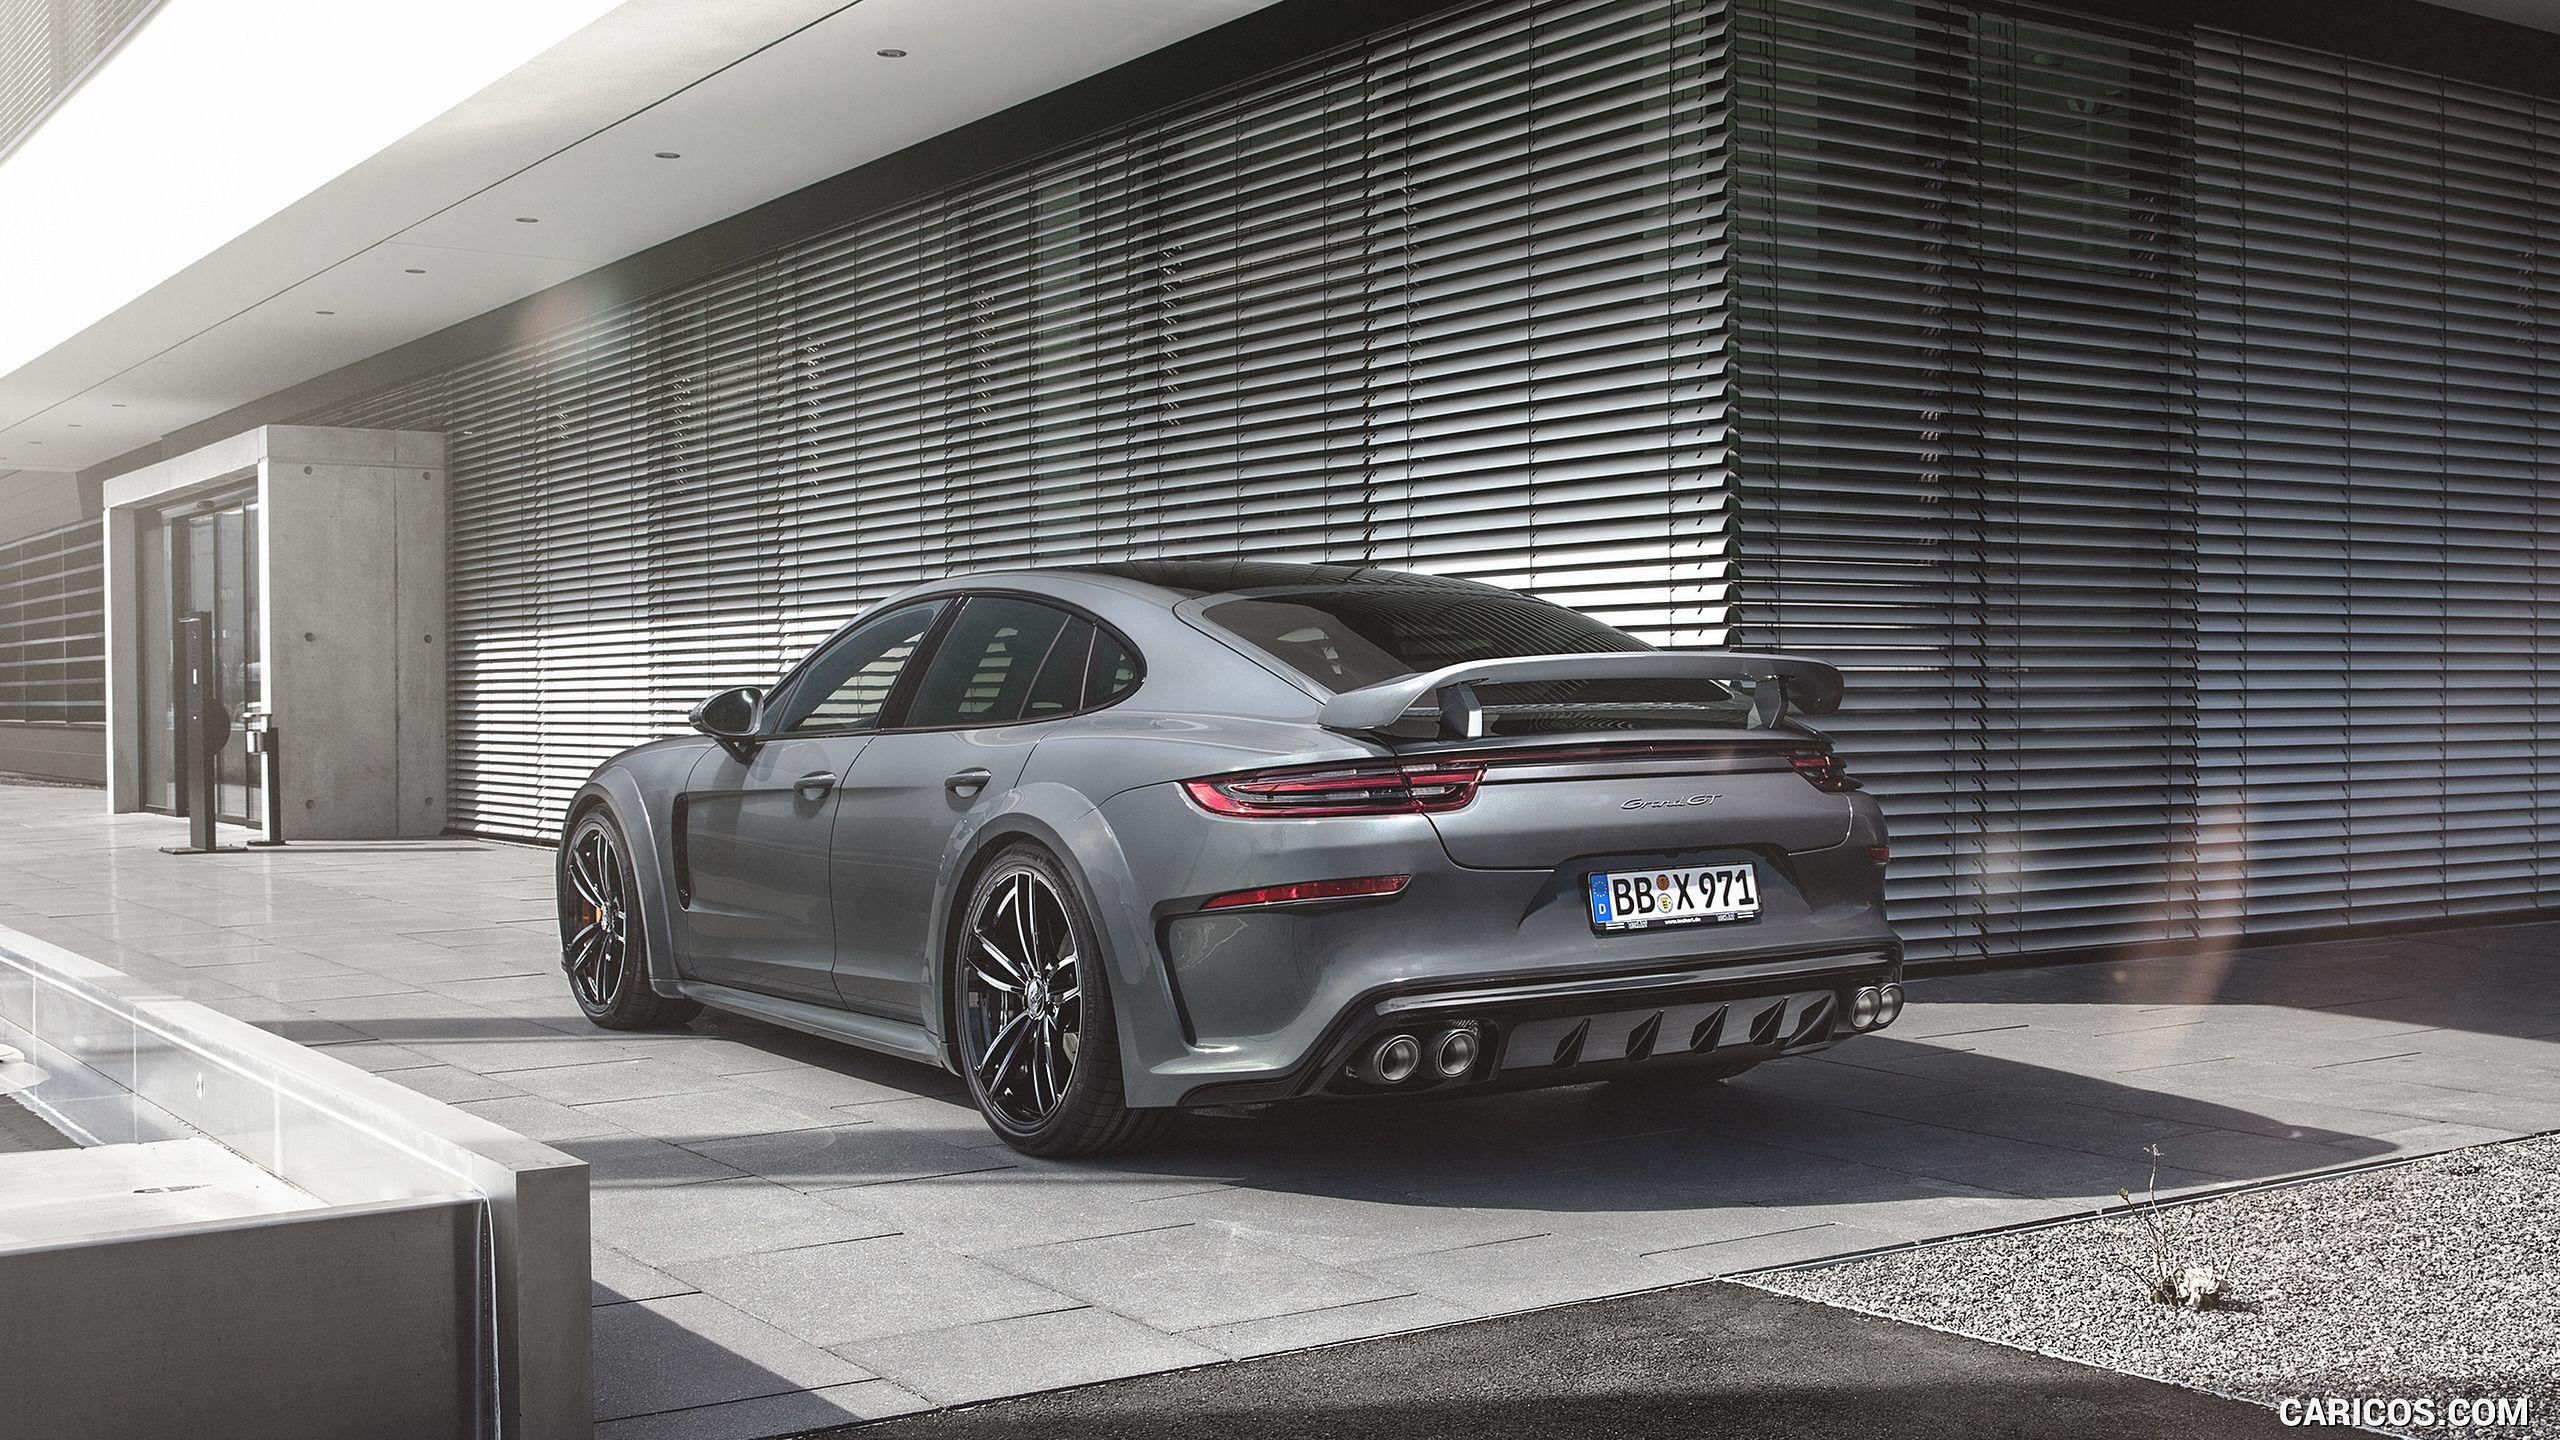 2017 TECHART GrandGT based on Porsche Panamera Wallpaper   tuning ... e5b41e5d94